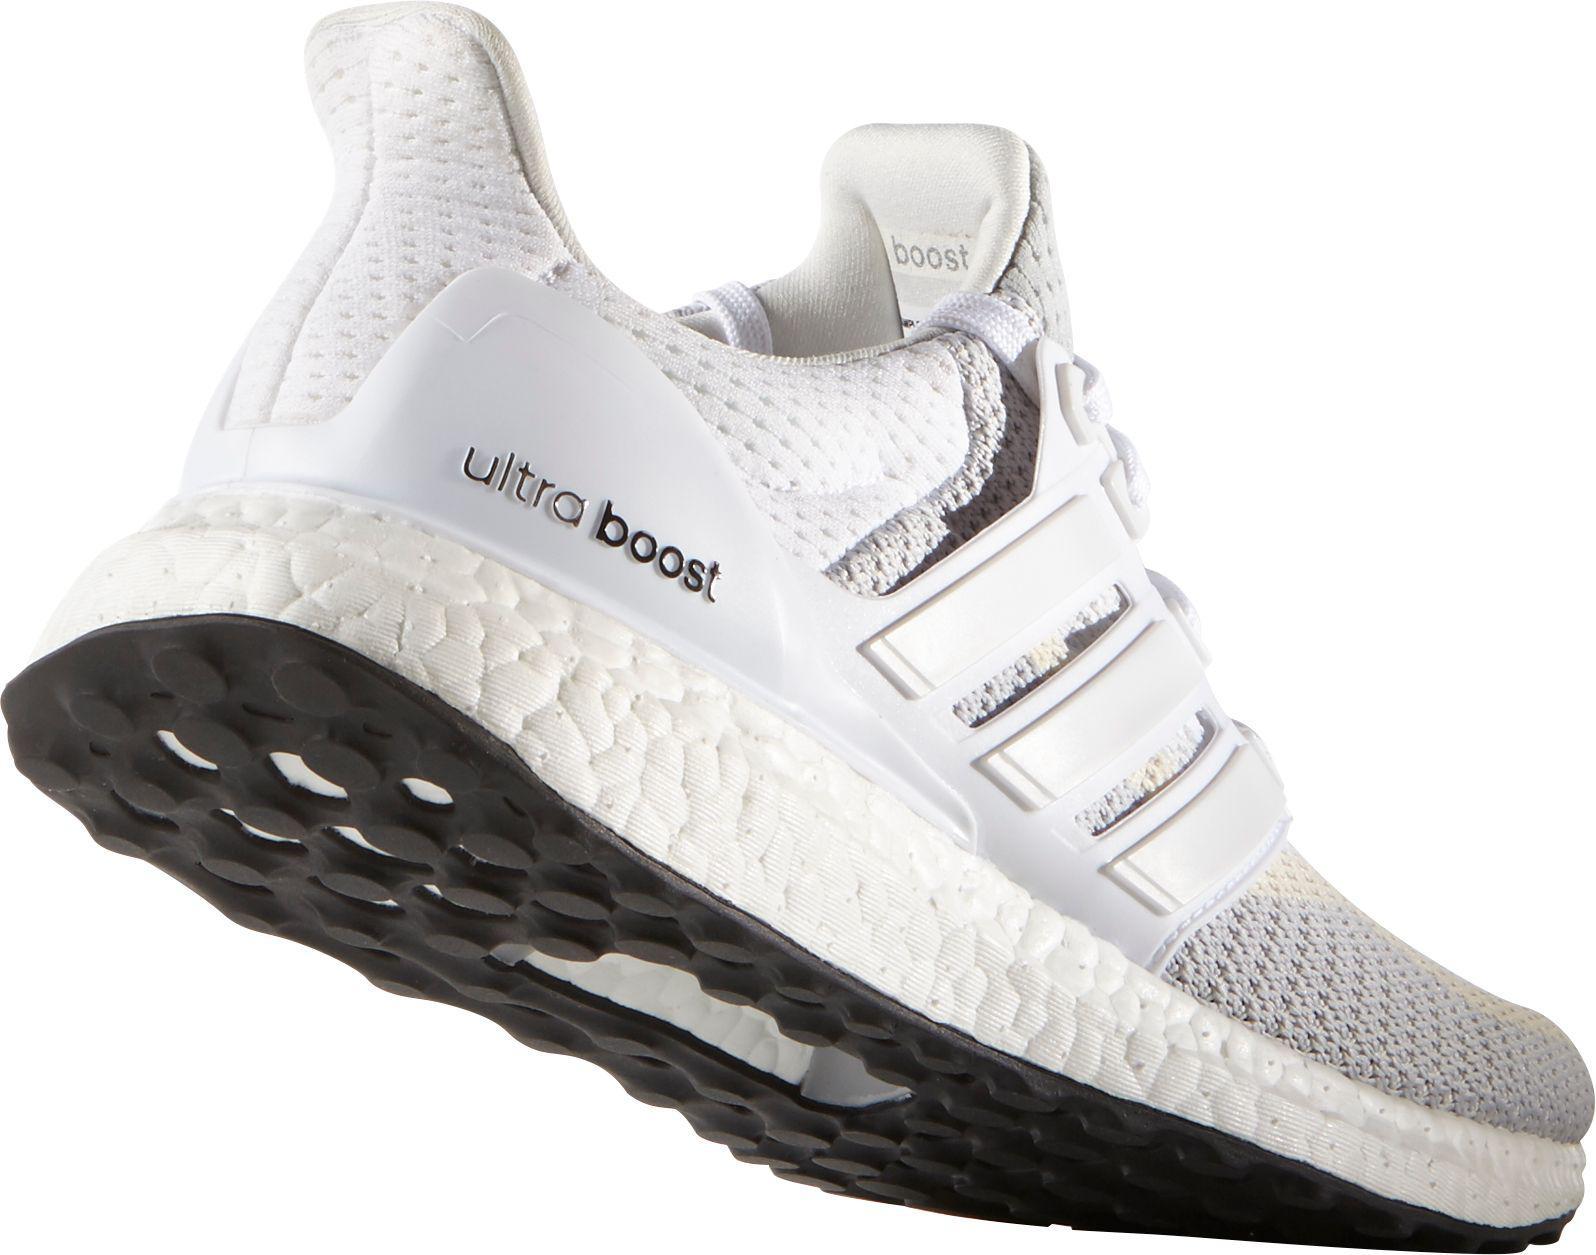 ffbab2c4f3186 Lyst - adidas Ultra Boost Running Shoes in Gray